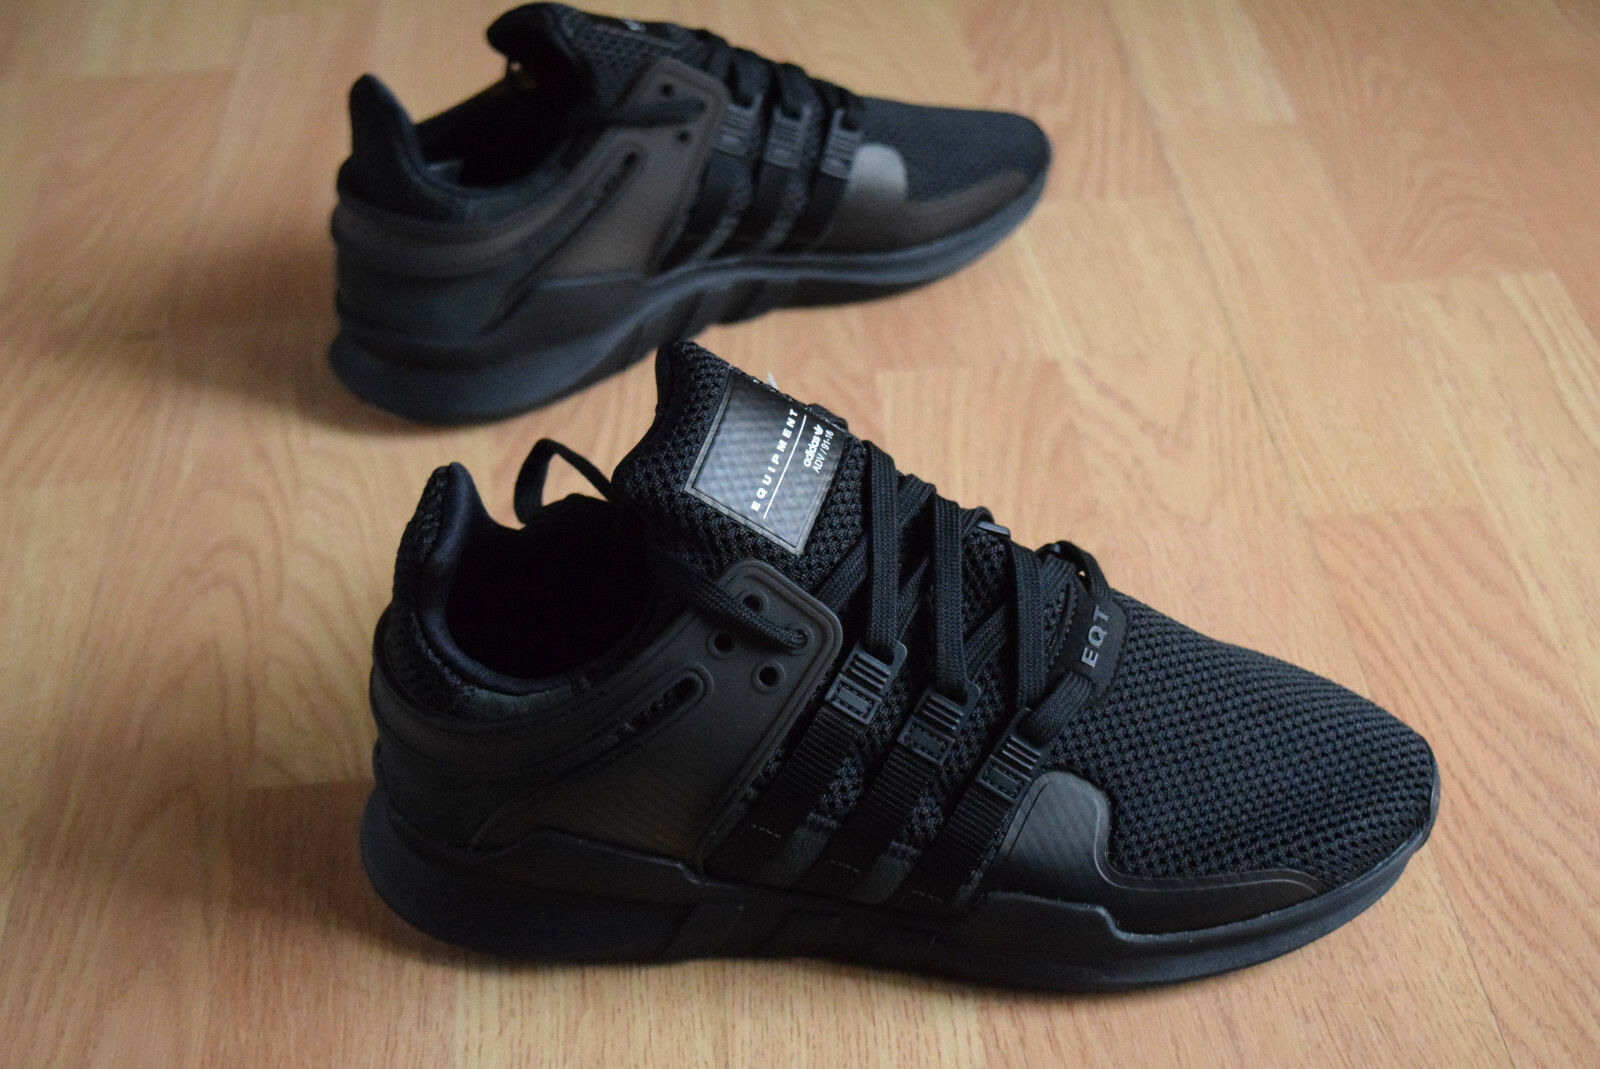 Adidas Equipment Support ADV 42,5 All black shadow nmd cOnSorTium 93 BA8329 EQT